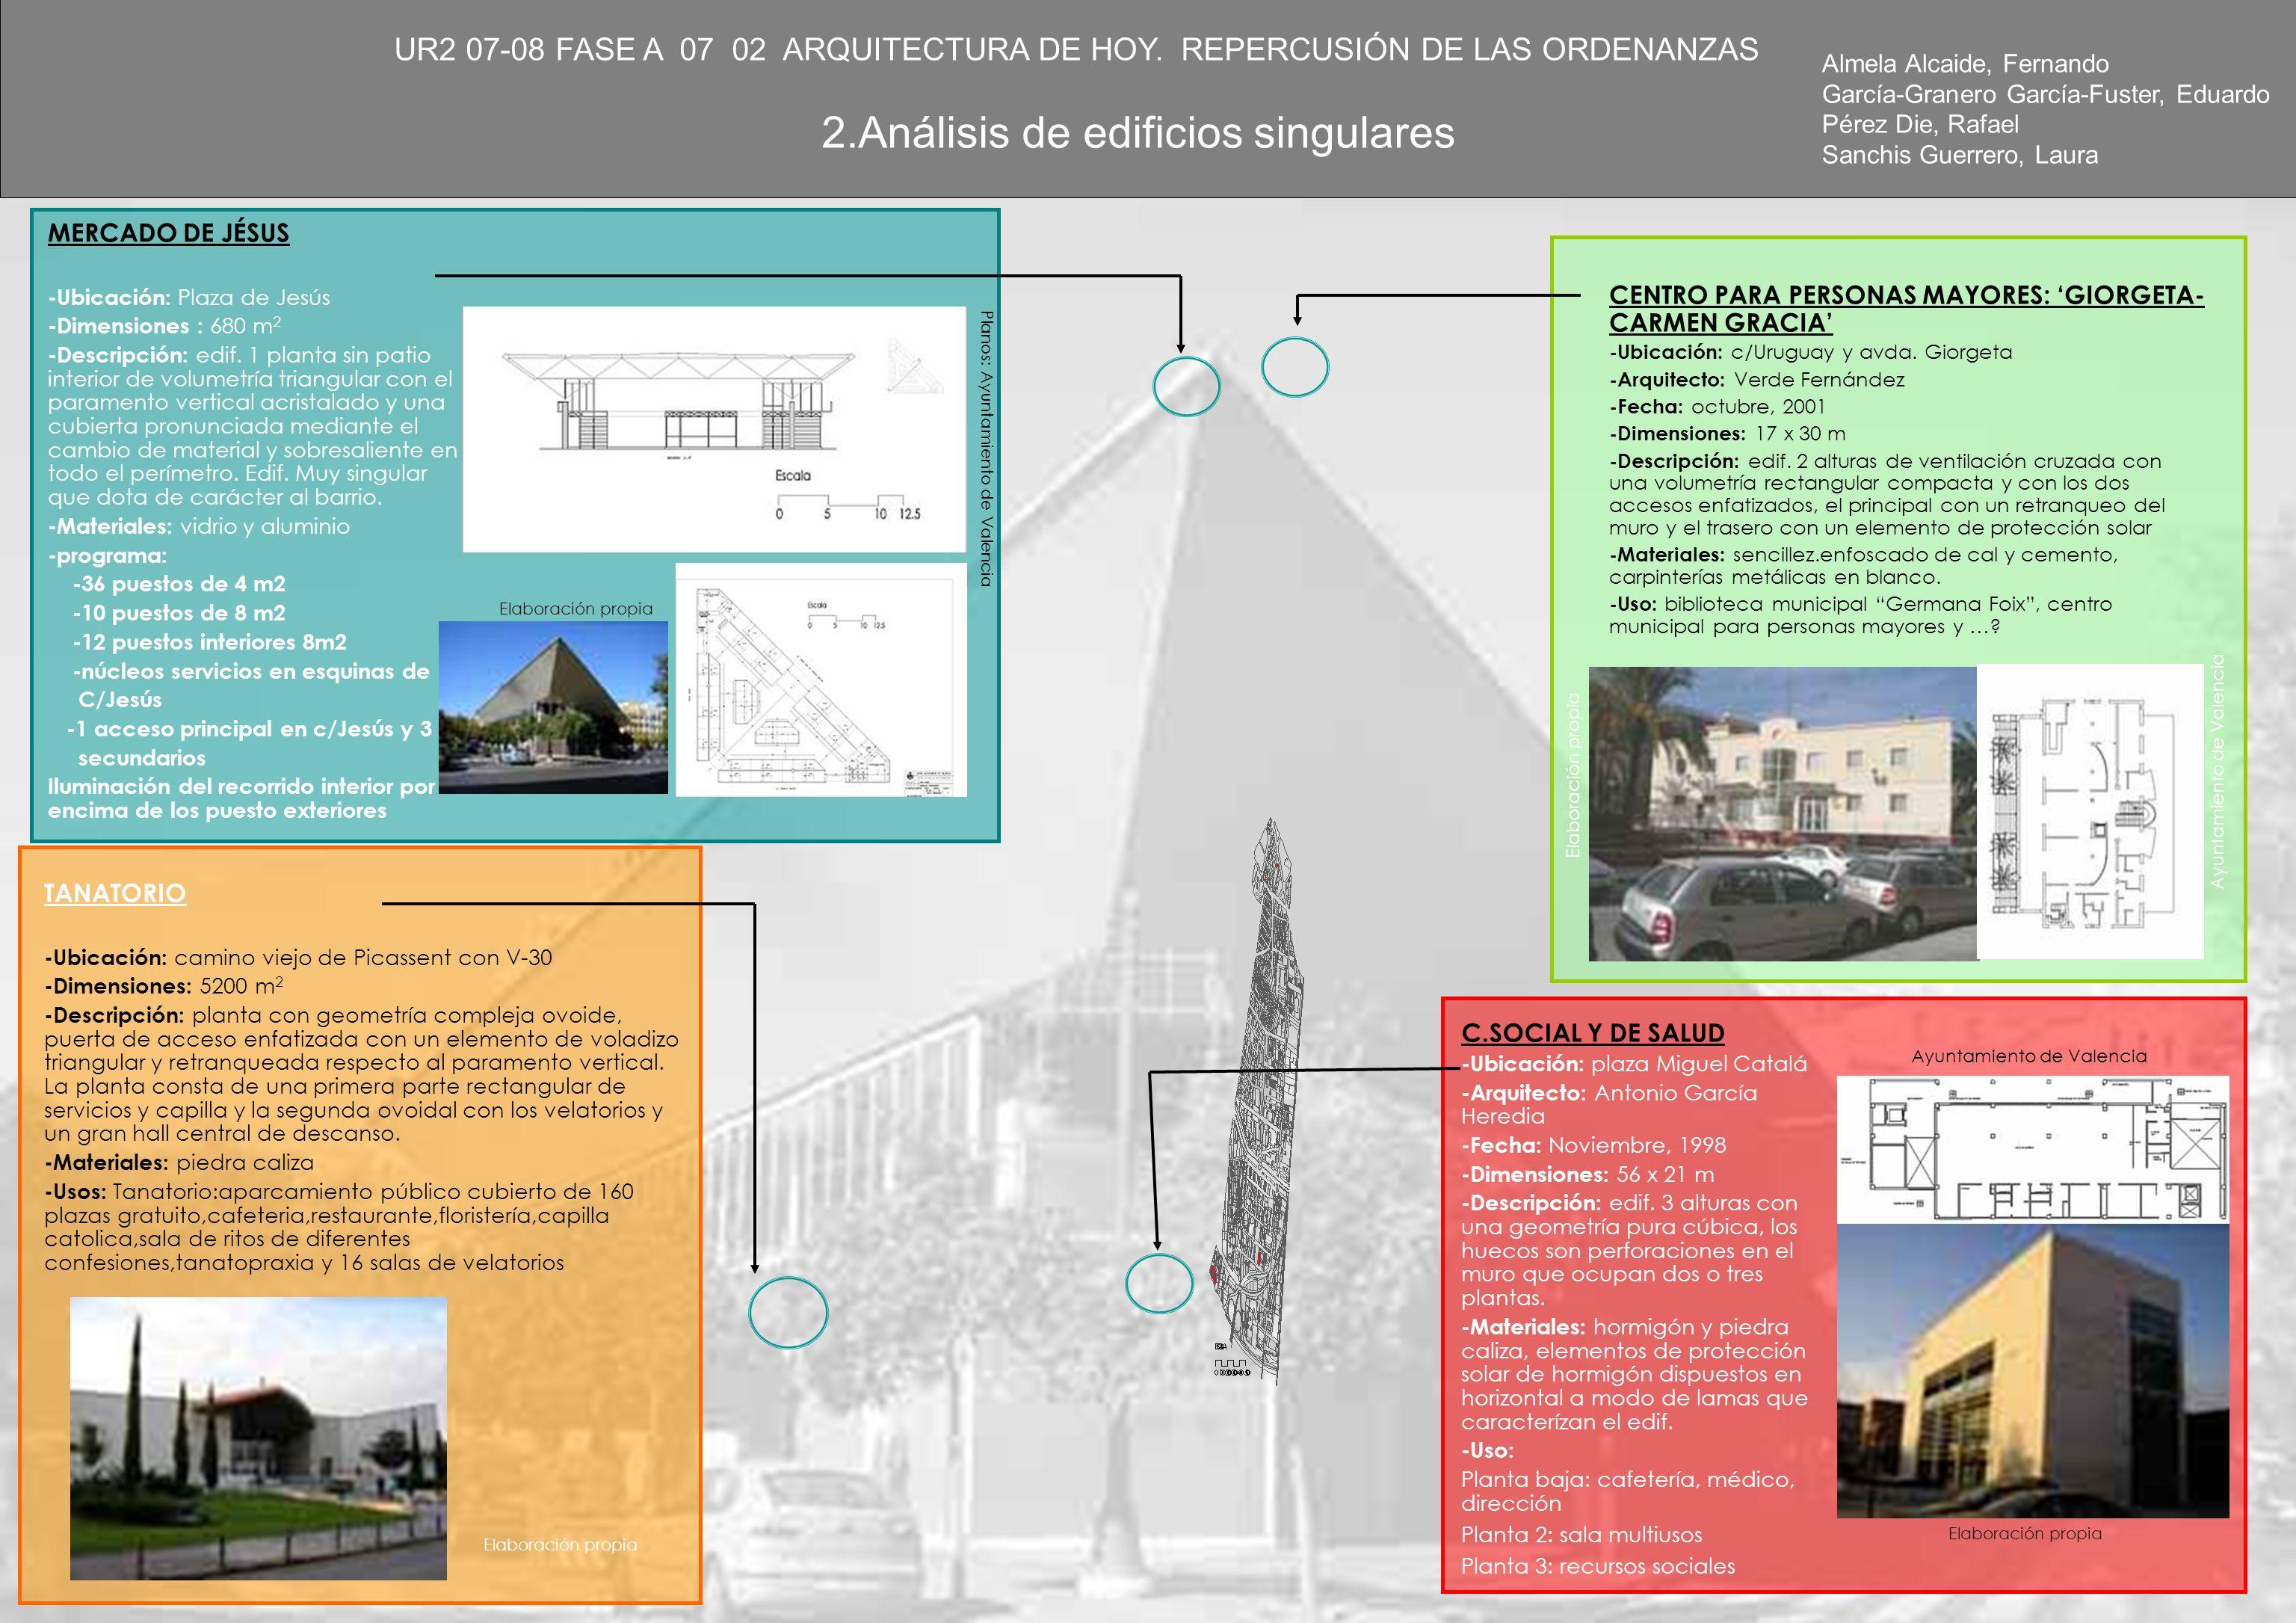 2.Análisis de edificios singulares